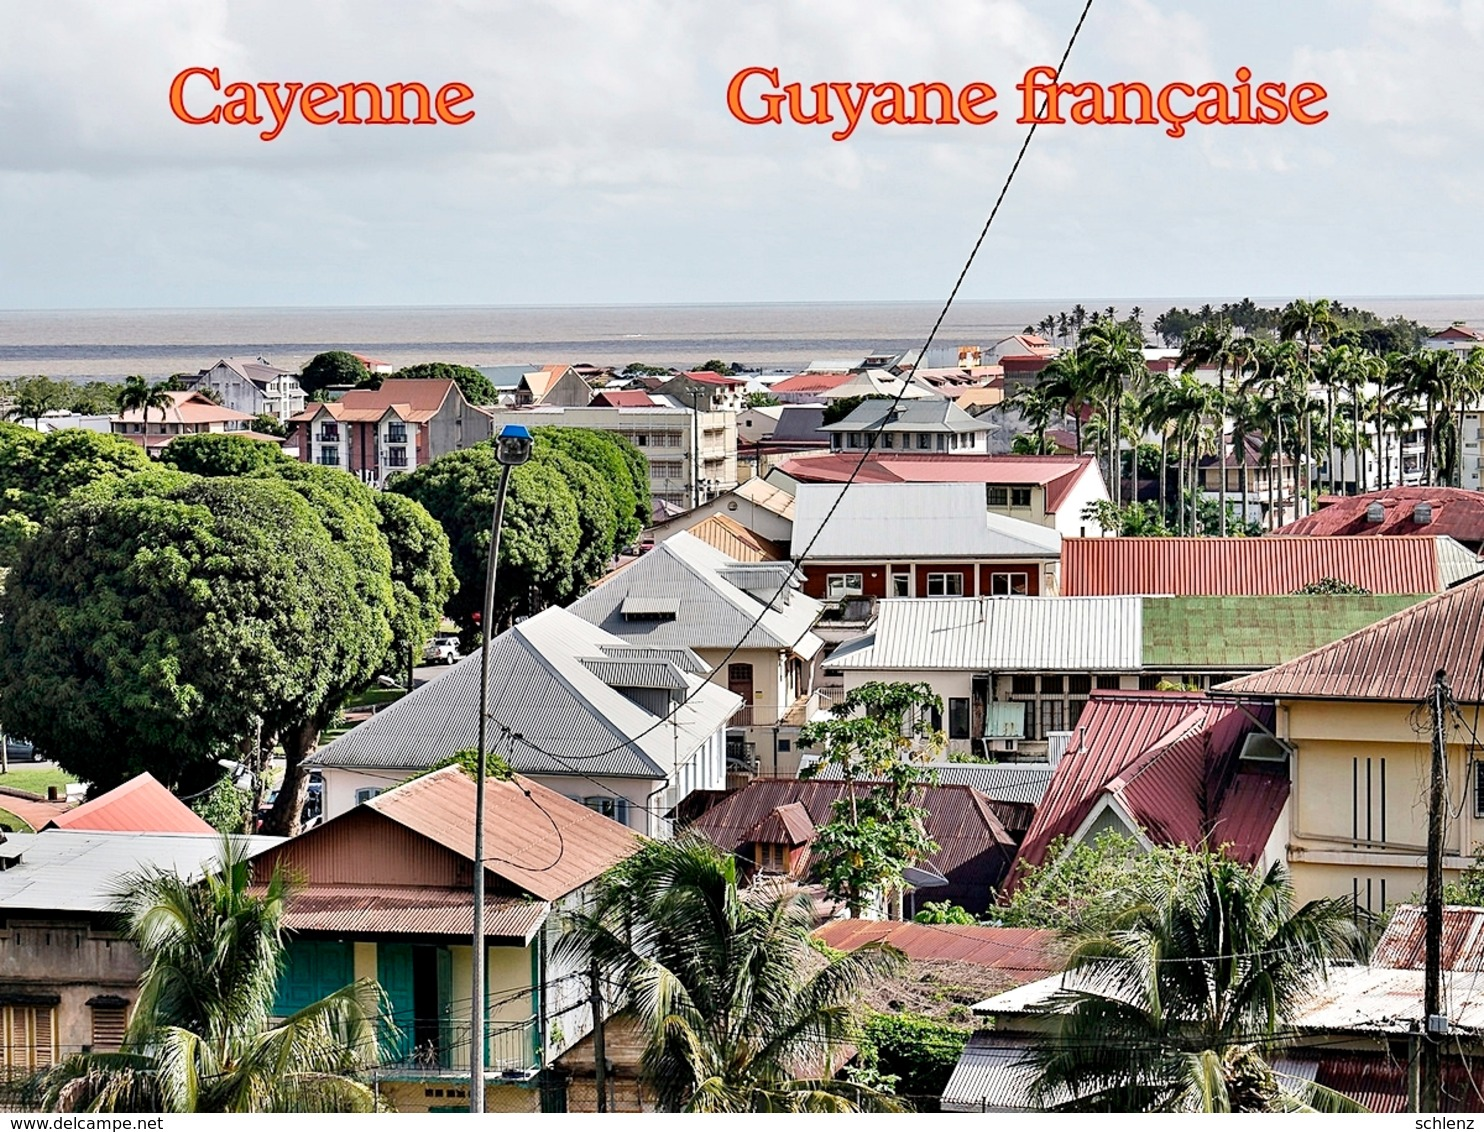 Cayenne Guyane Francaise 7 - Ansichtskarten